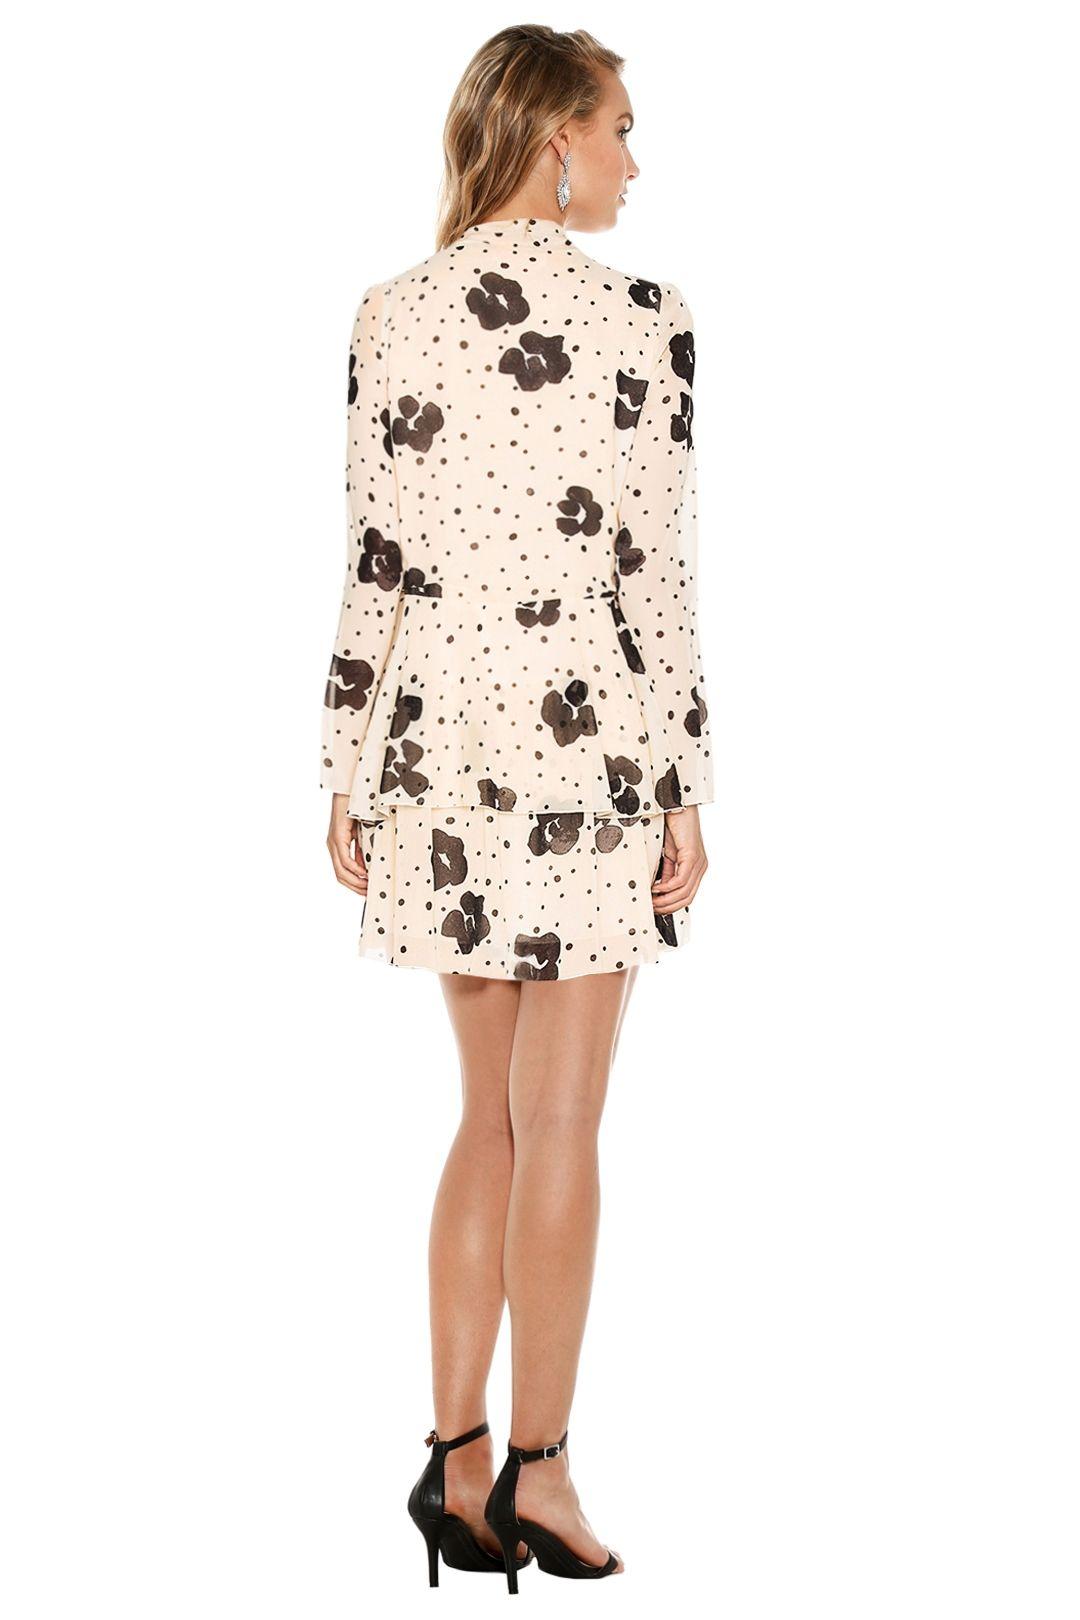 See by Chloé - Leopard Print On Silk Dress - Leopard Print - Back